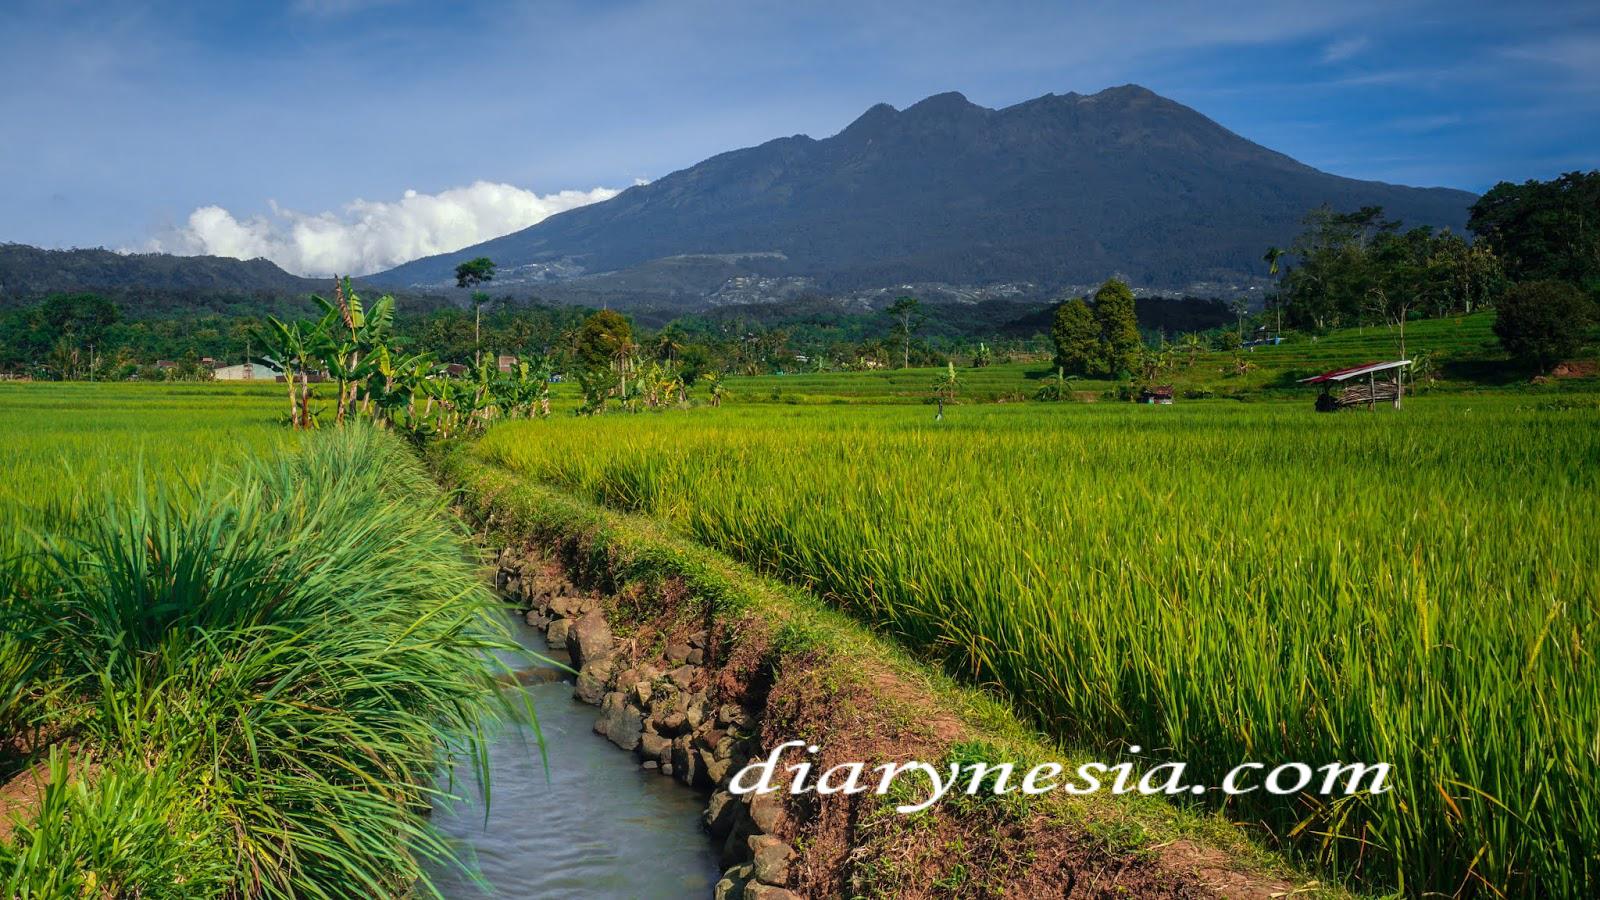 Hiking vacations Indonesia, Mountain Tours and Hikes, Hiking trips Indonesia, diarynesia